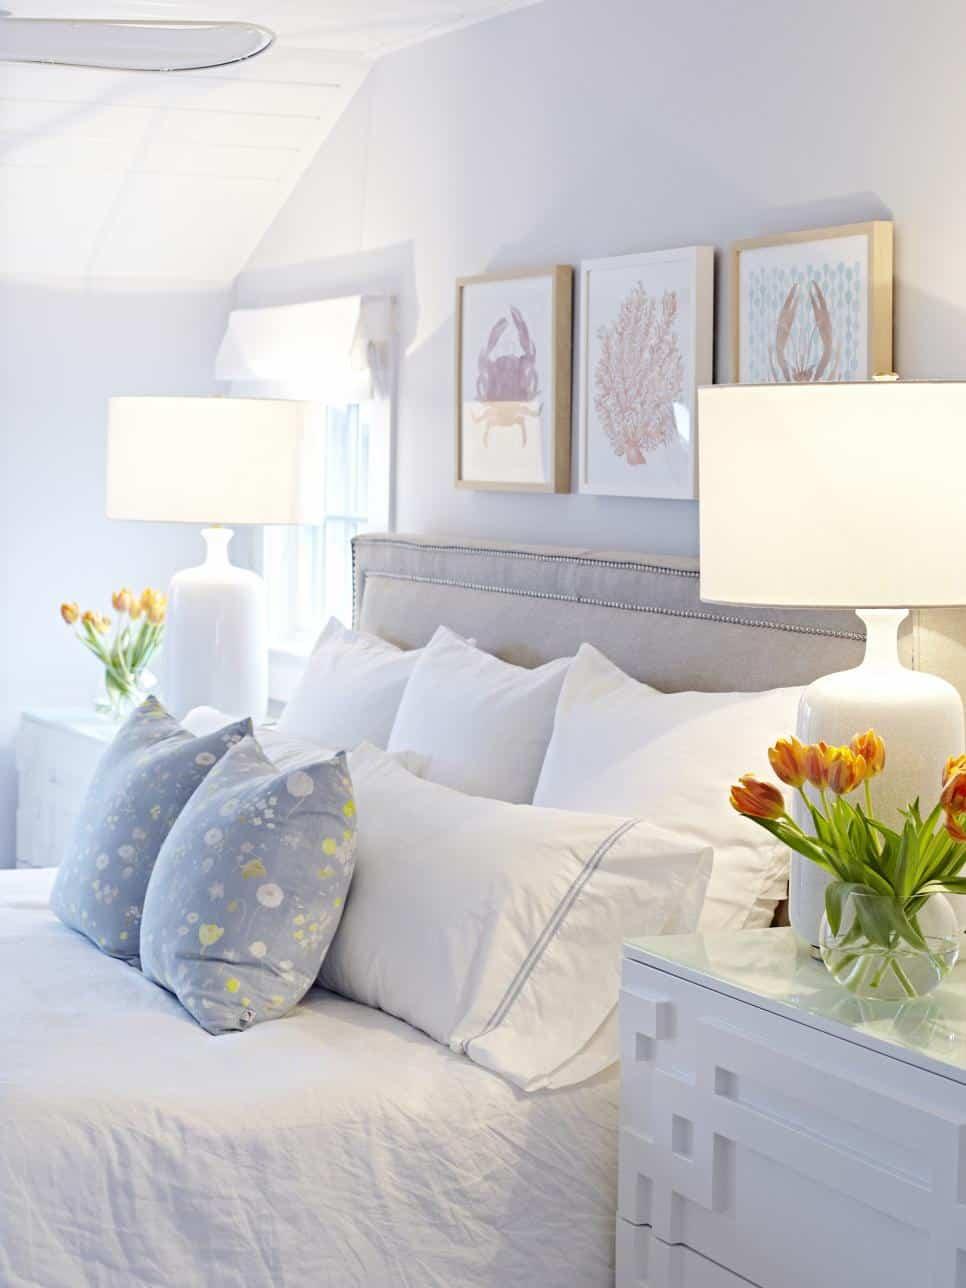 Perfect symmetry bedroom design